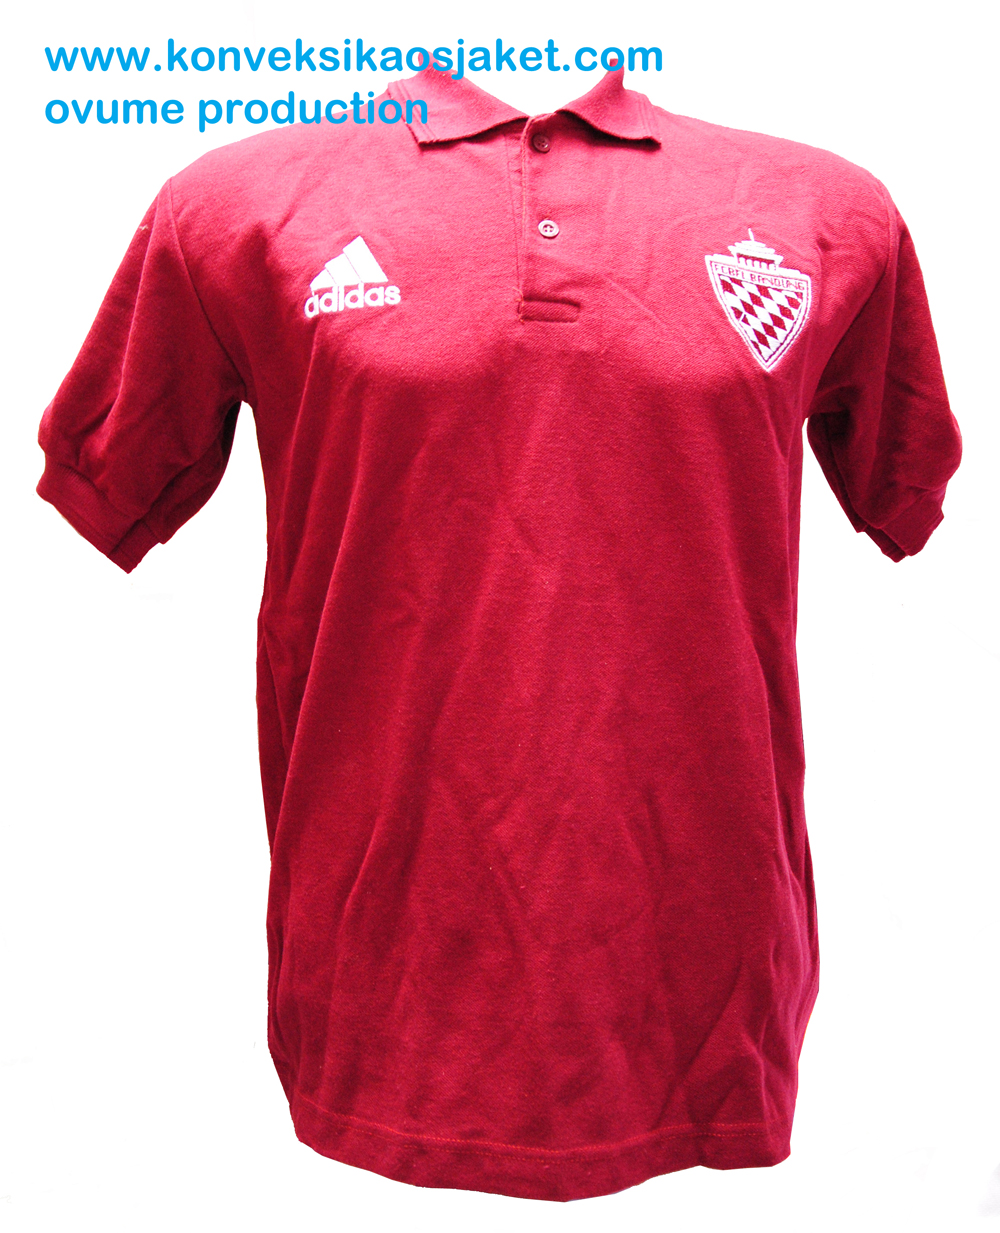 http://1.bp.blogspot.com/-pdmb2xM8LWk/UQcAxBYYepI/AAAAAAAAA1I/0Uq4AzFKGG4/s1600/polo+shirt+FCBI+-+Copy.jpg